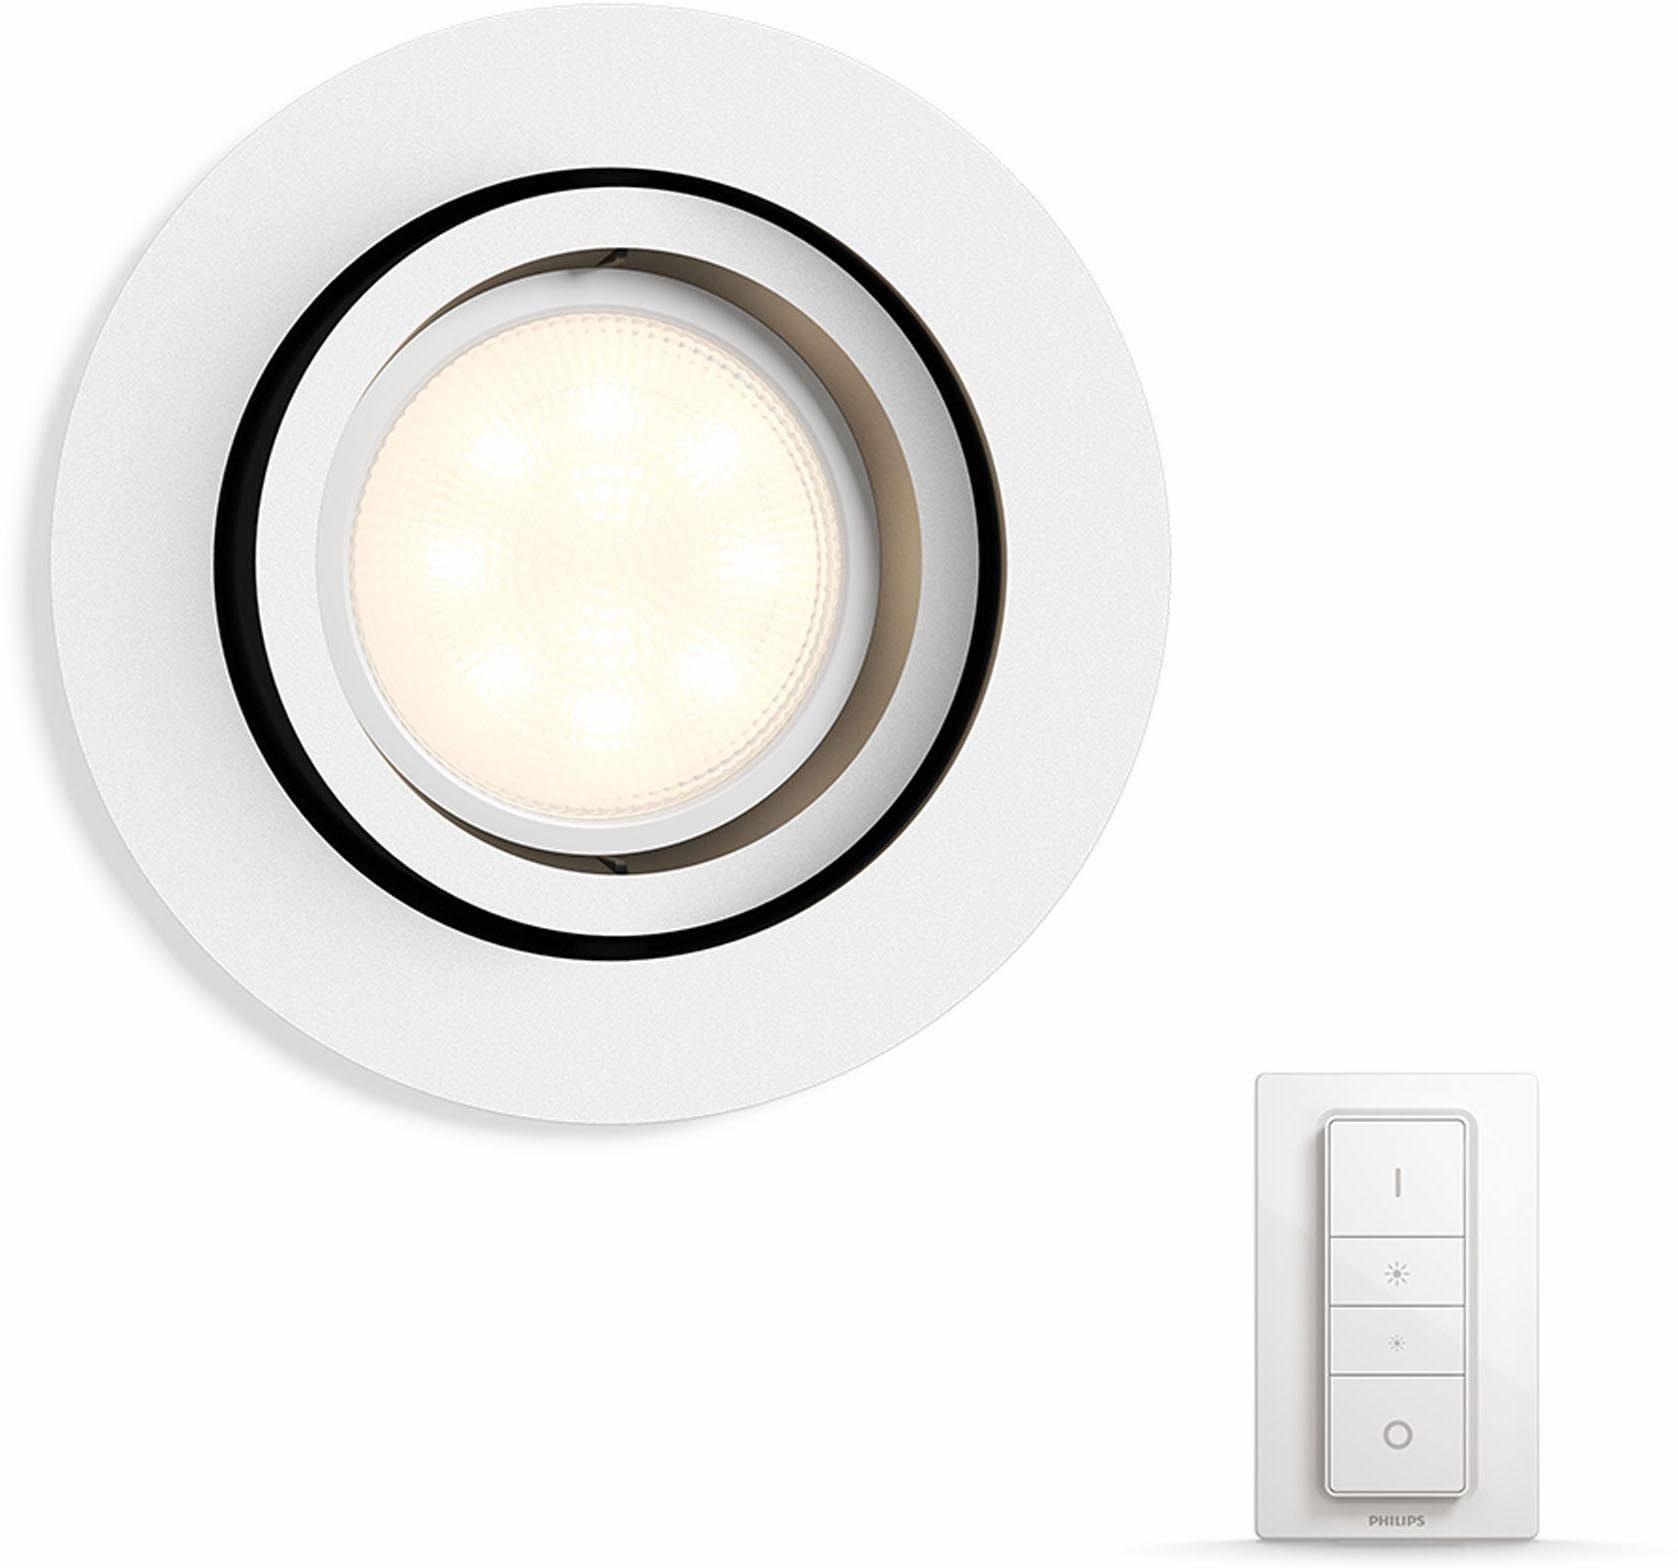 Philips Hue LED Einbaustrahler »Milliskin«, 1-flammig, Smart Home